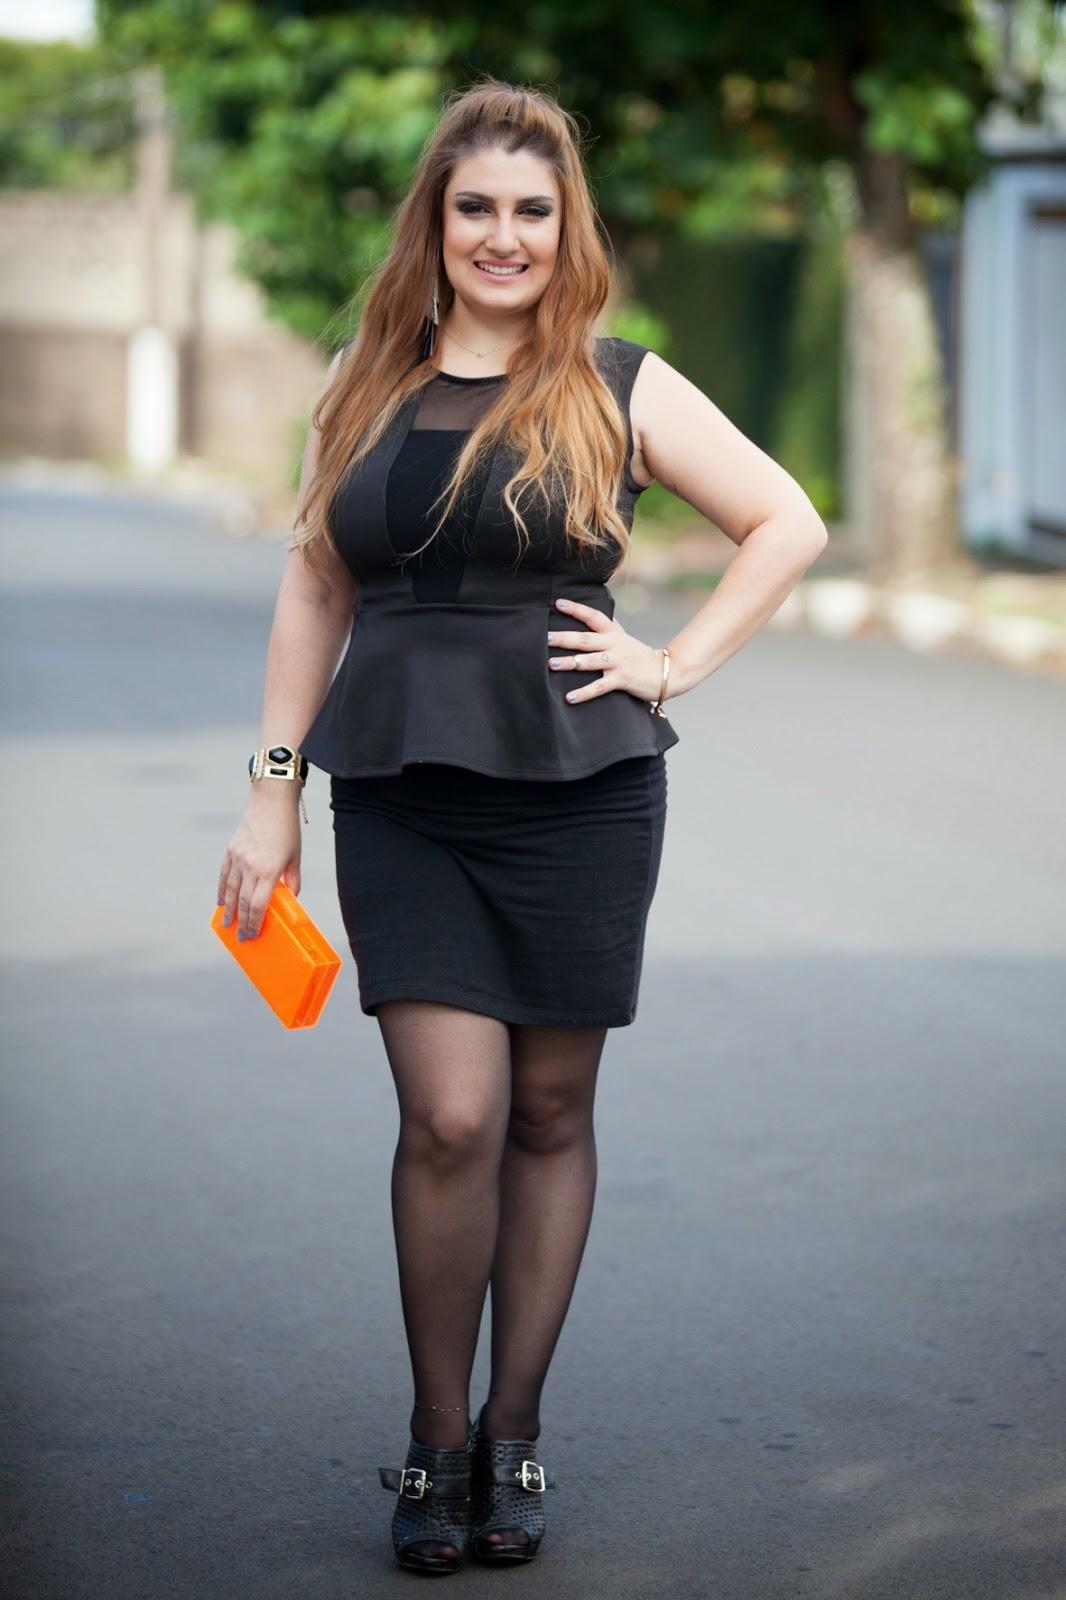 giovana quaglio, look, look do dia, clutch, laranja, forever 21